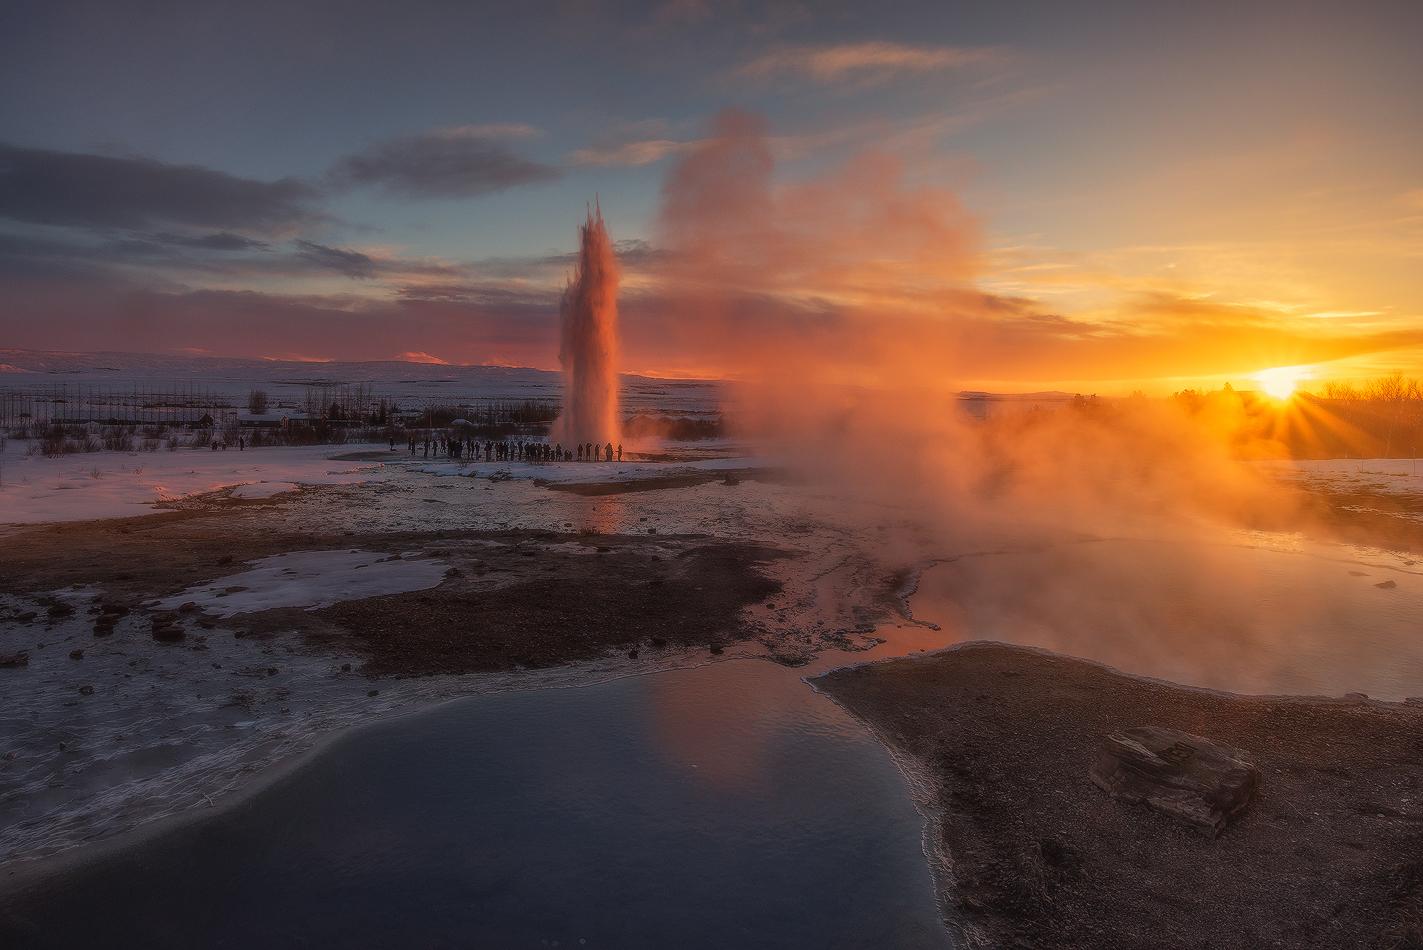 Strokkur间歇泉在夕阳下壮丽喷发